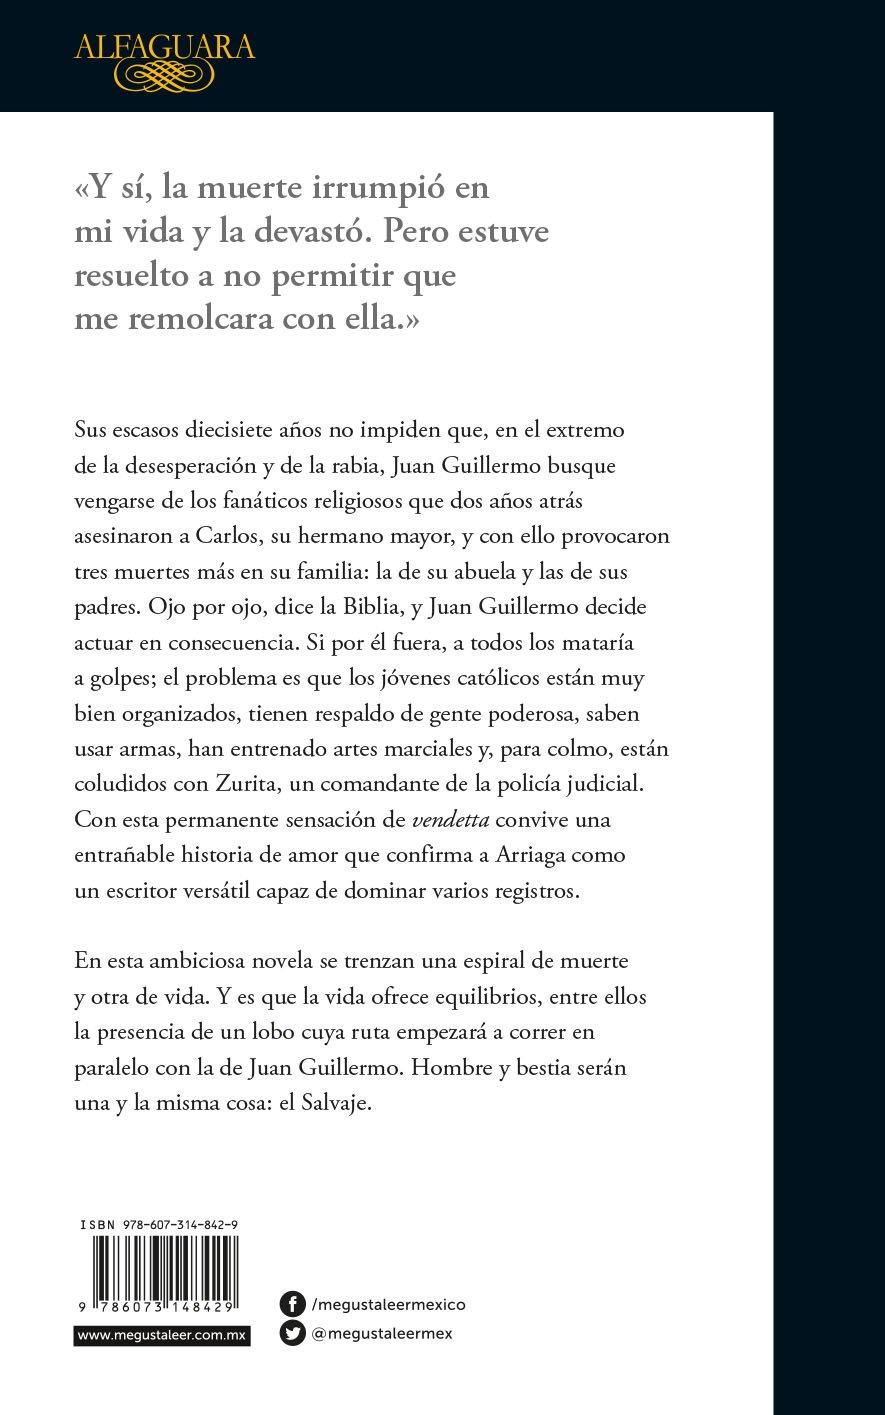 El Salvaje (spanish Edition): Guillermo Arriaga: 9786073148429: Amazon:  Books